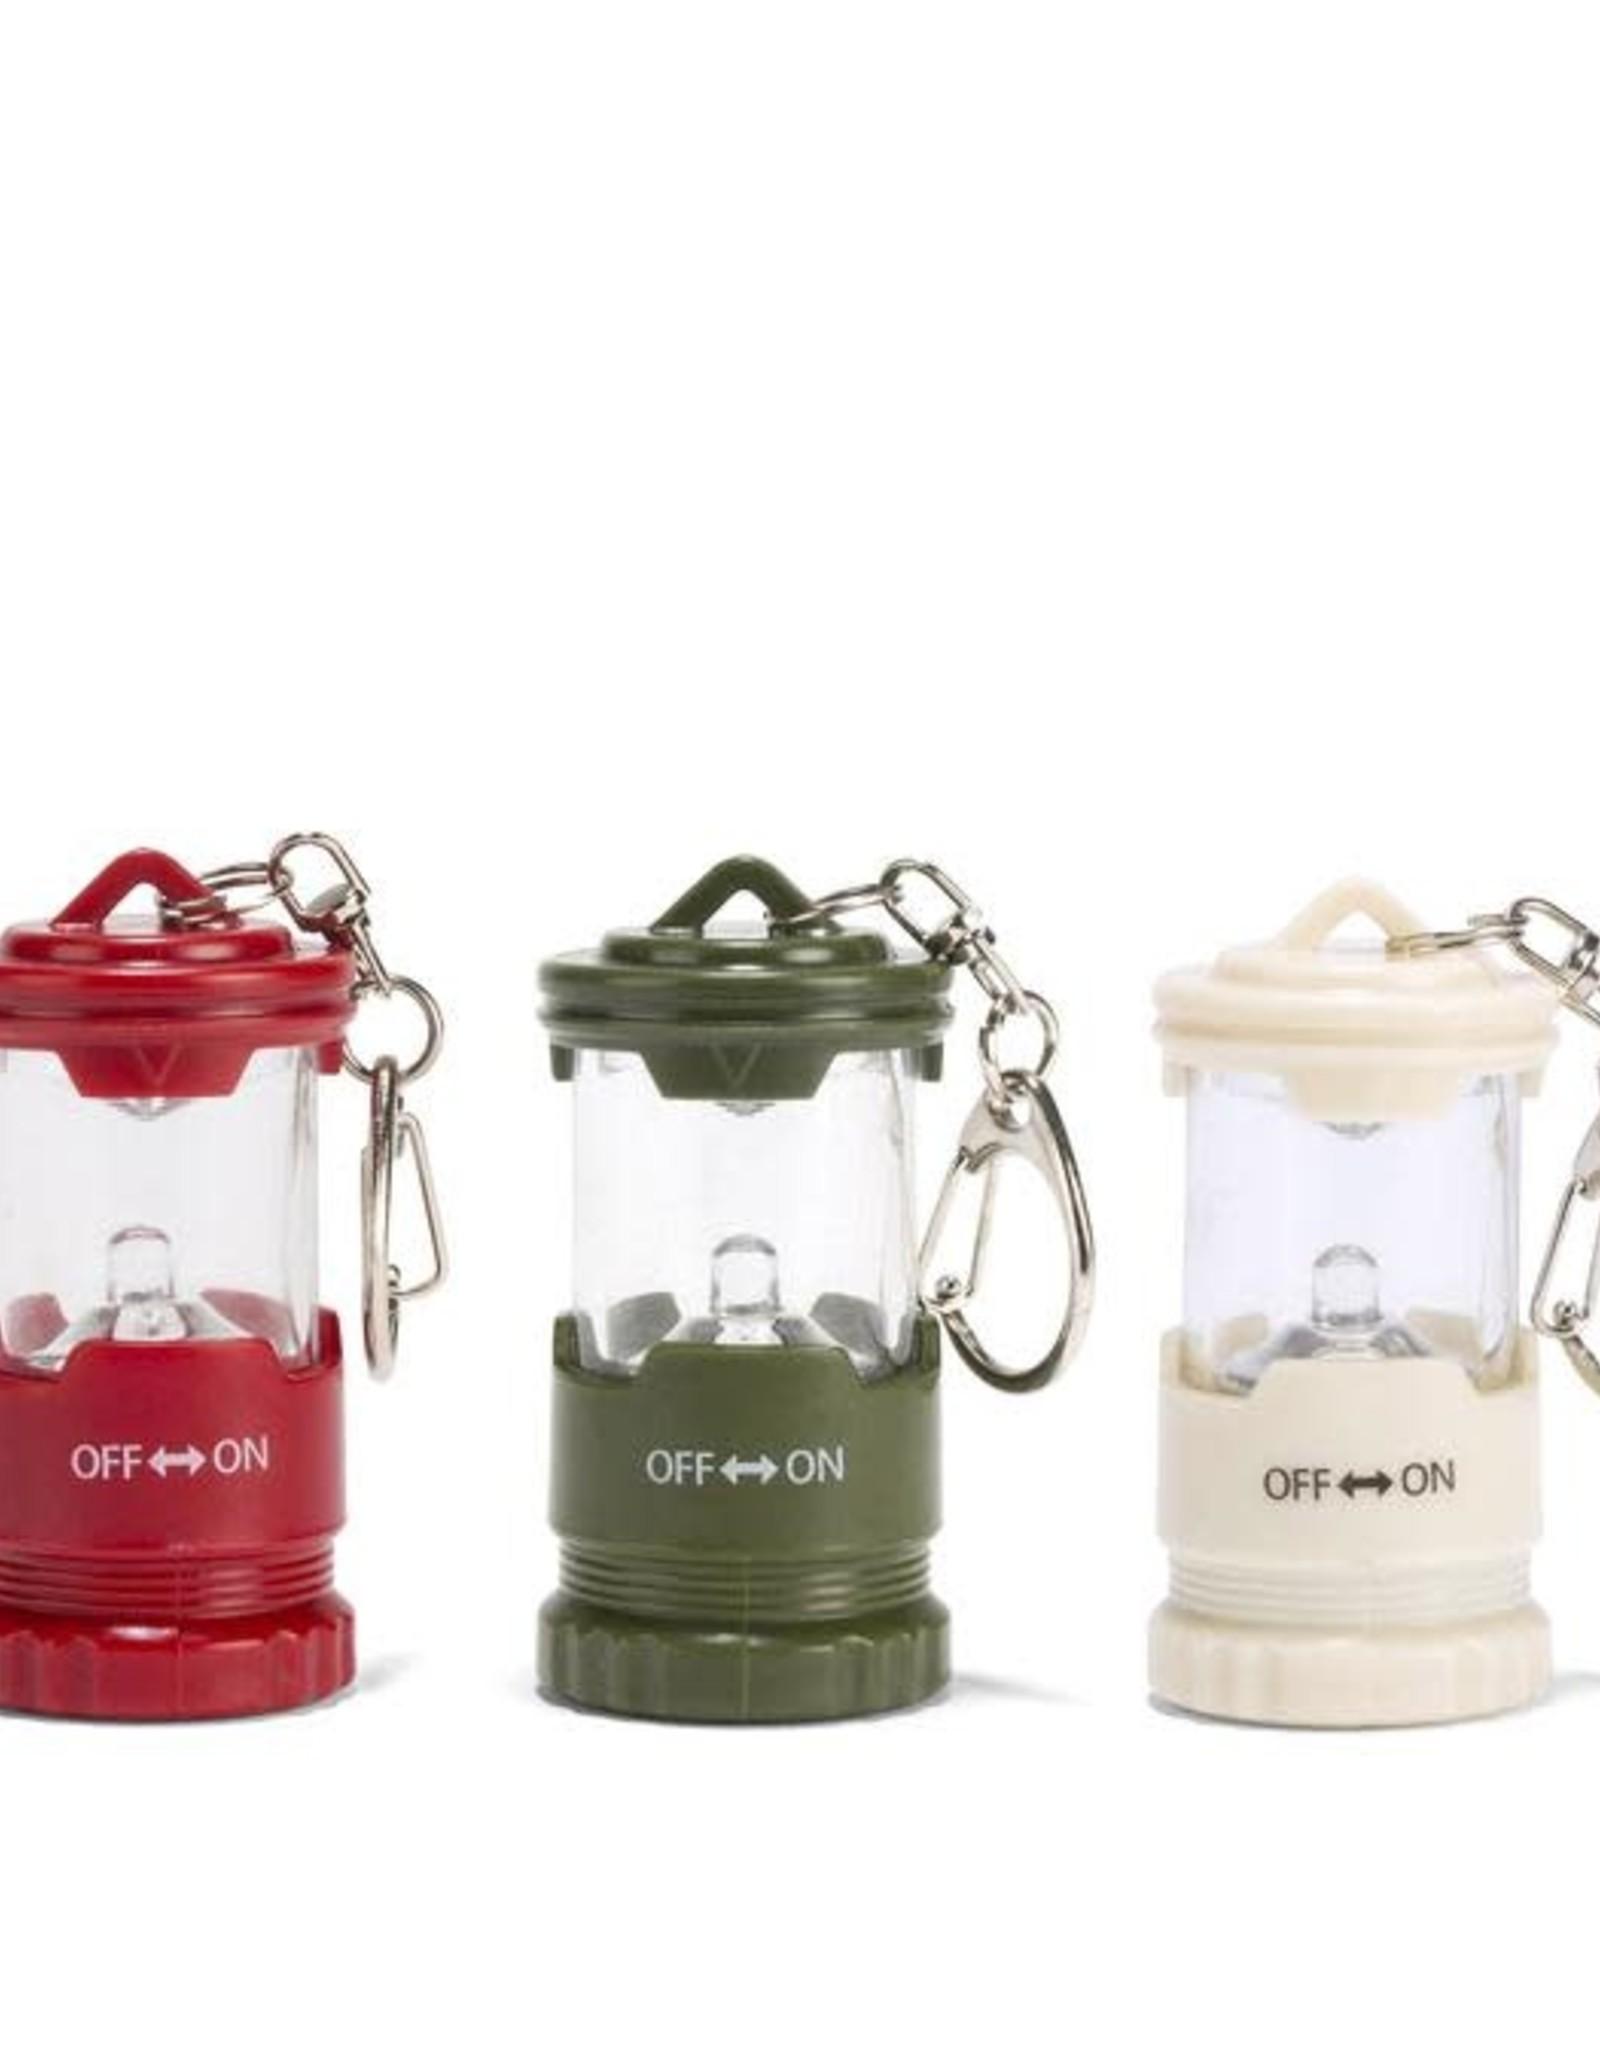 Kikkerland Mini Lantern Keychain